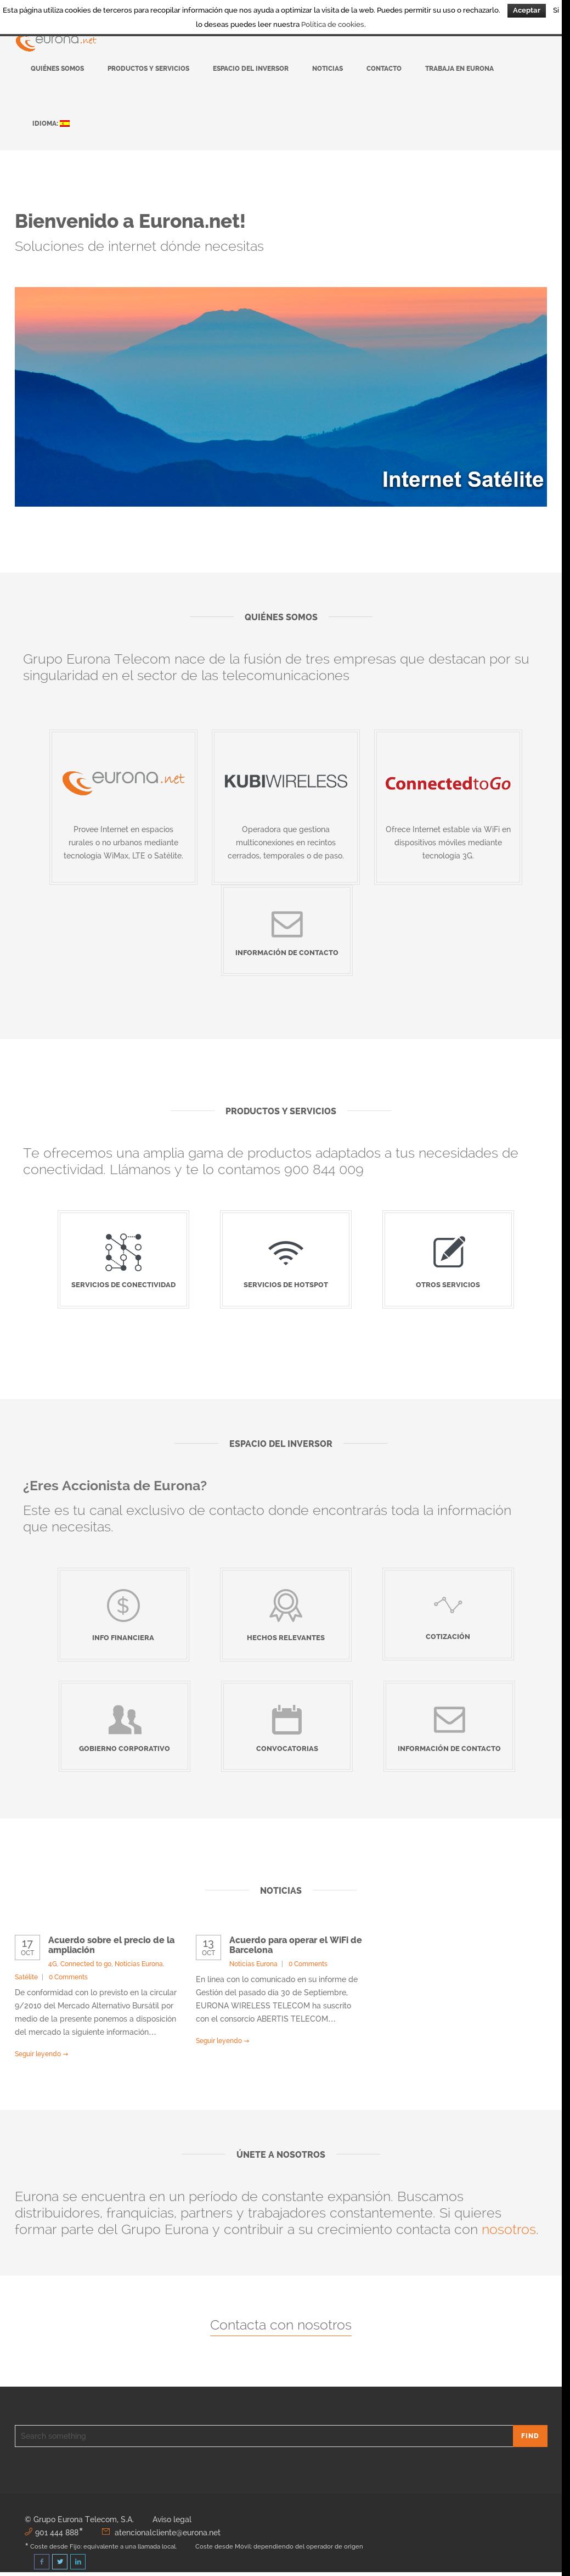 Eurona Wireless Telecom Competitors, Revenue and Employees - Owler